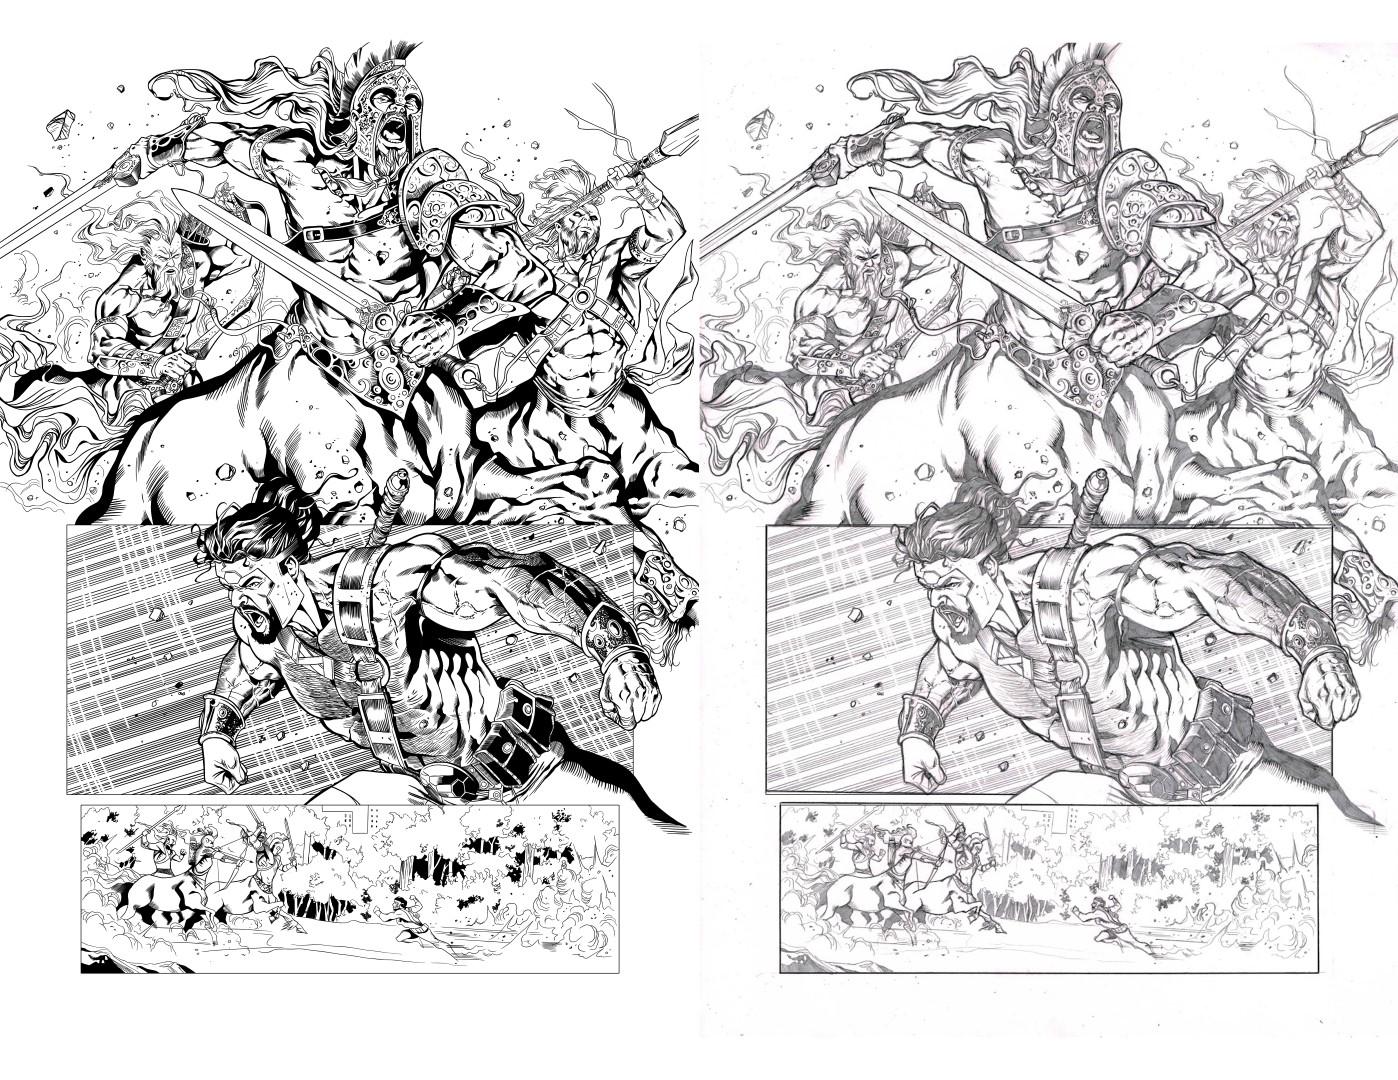 Inks over Sergio Davila Hercules